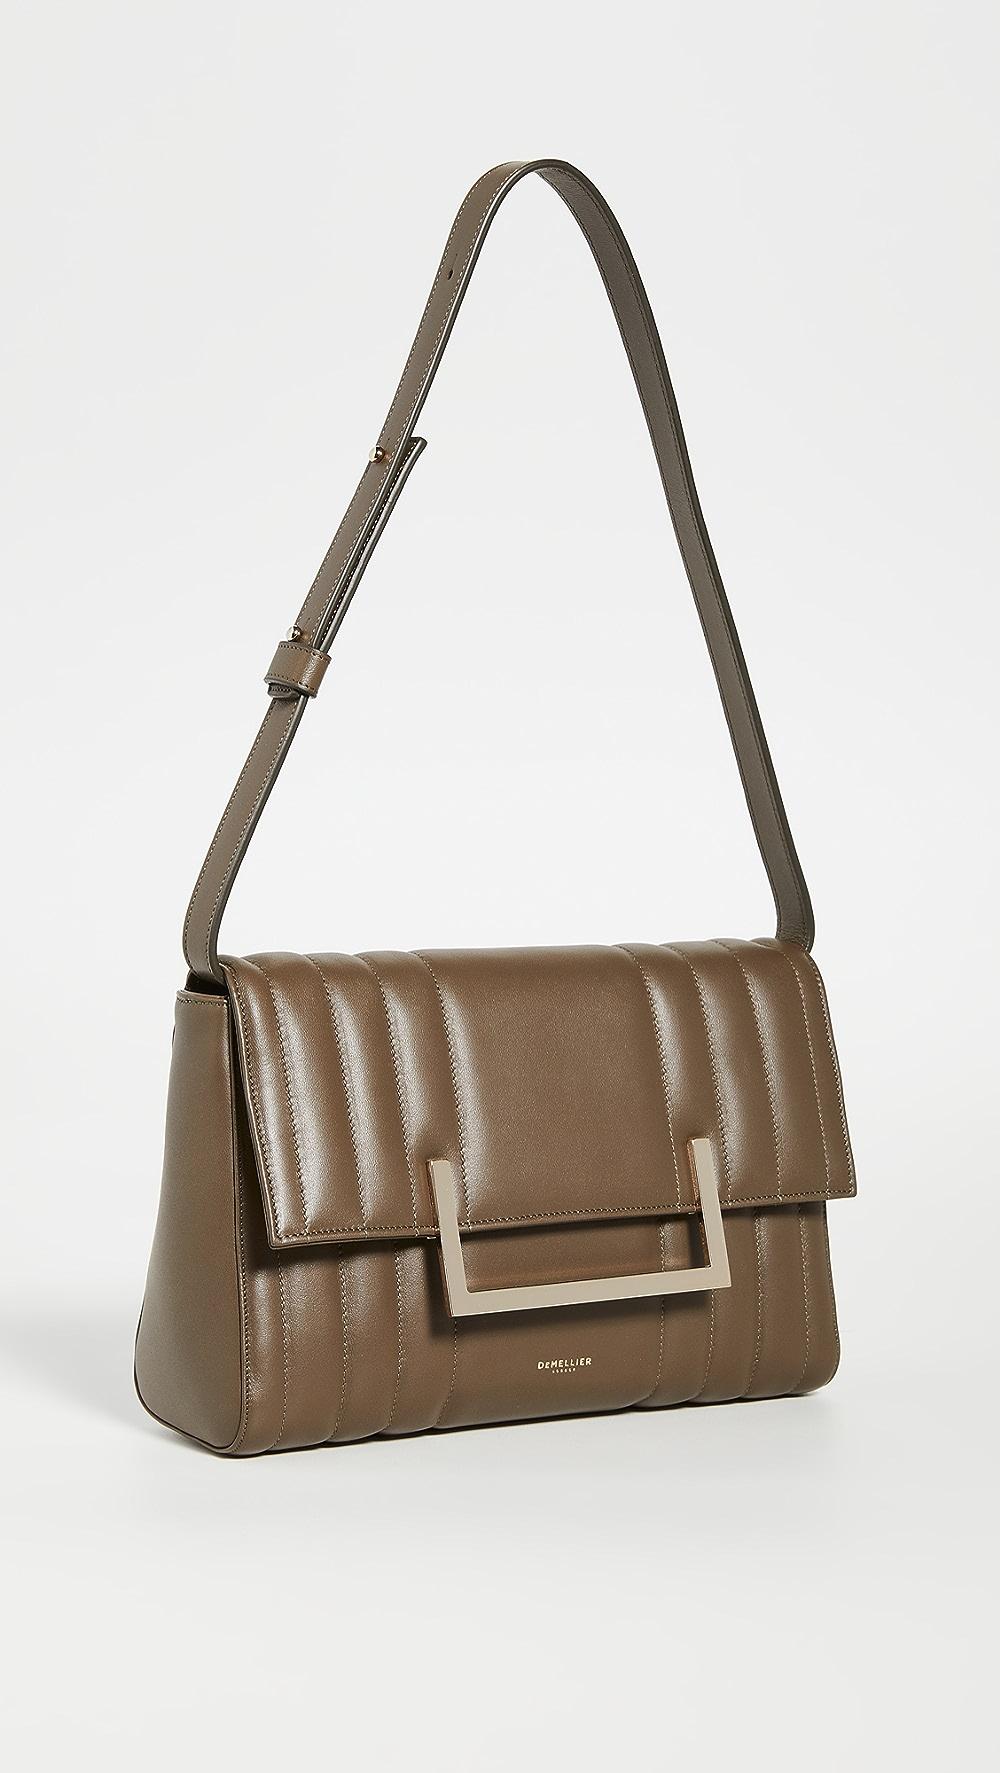 New Fashion Demellier - Biarritz Bag Evident Effect